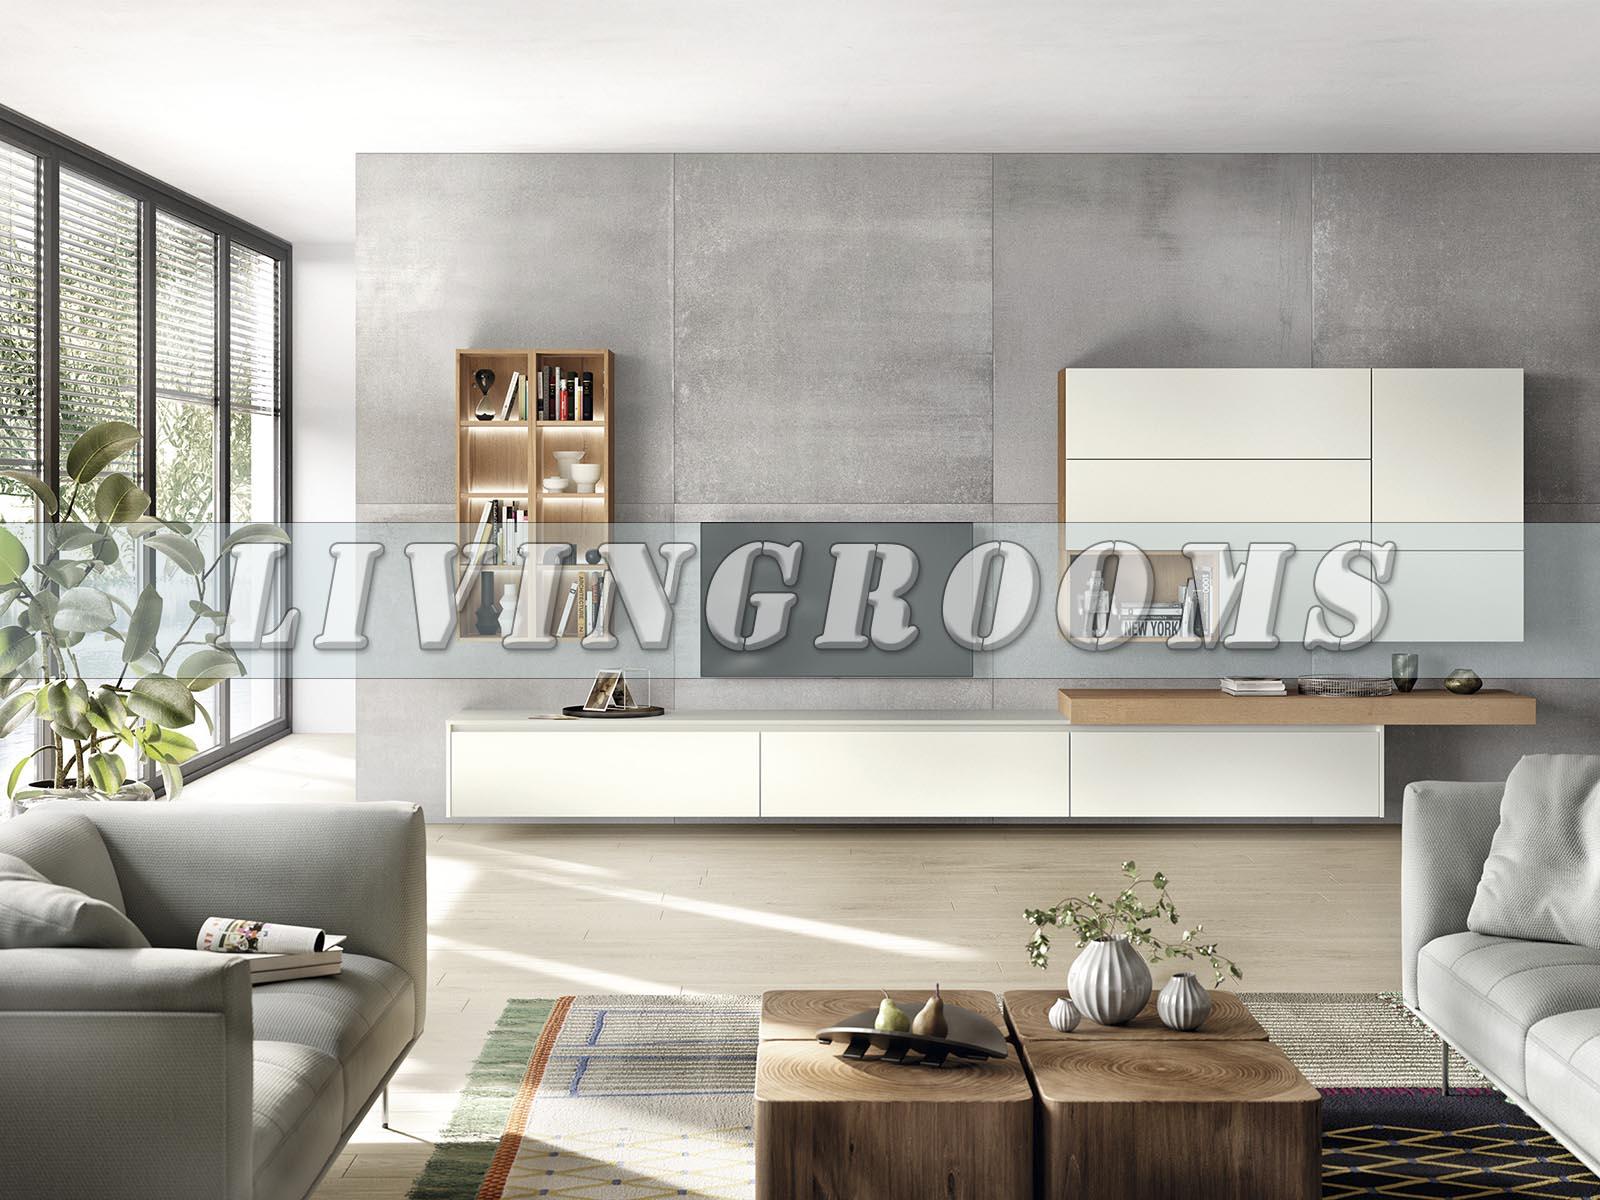 Küchentime Livingrooms